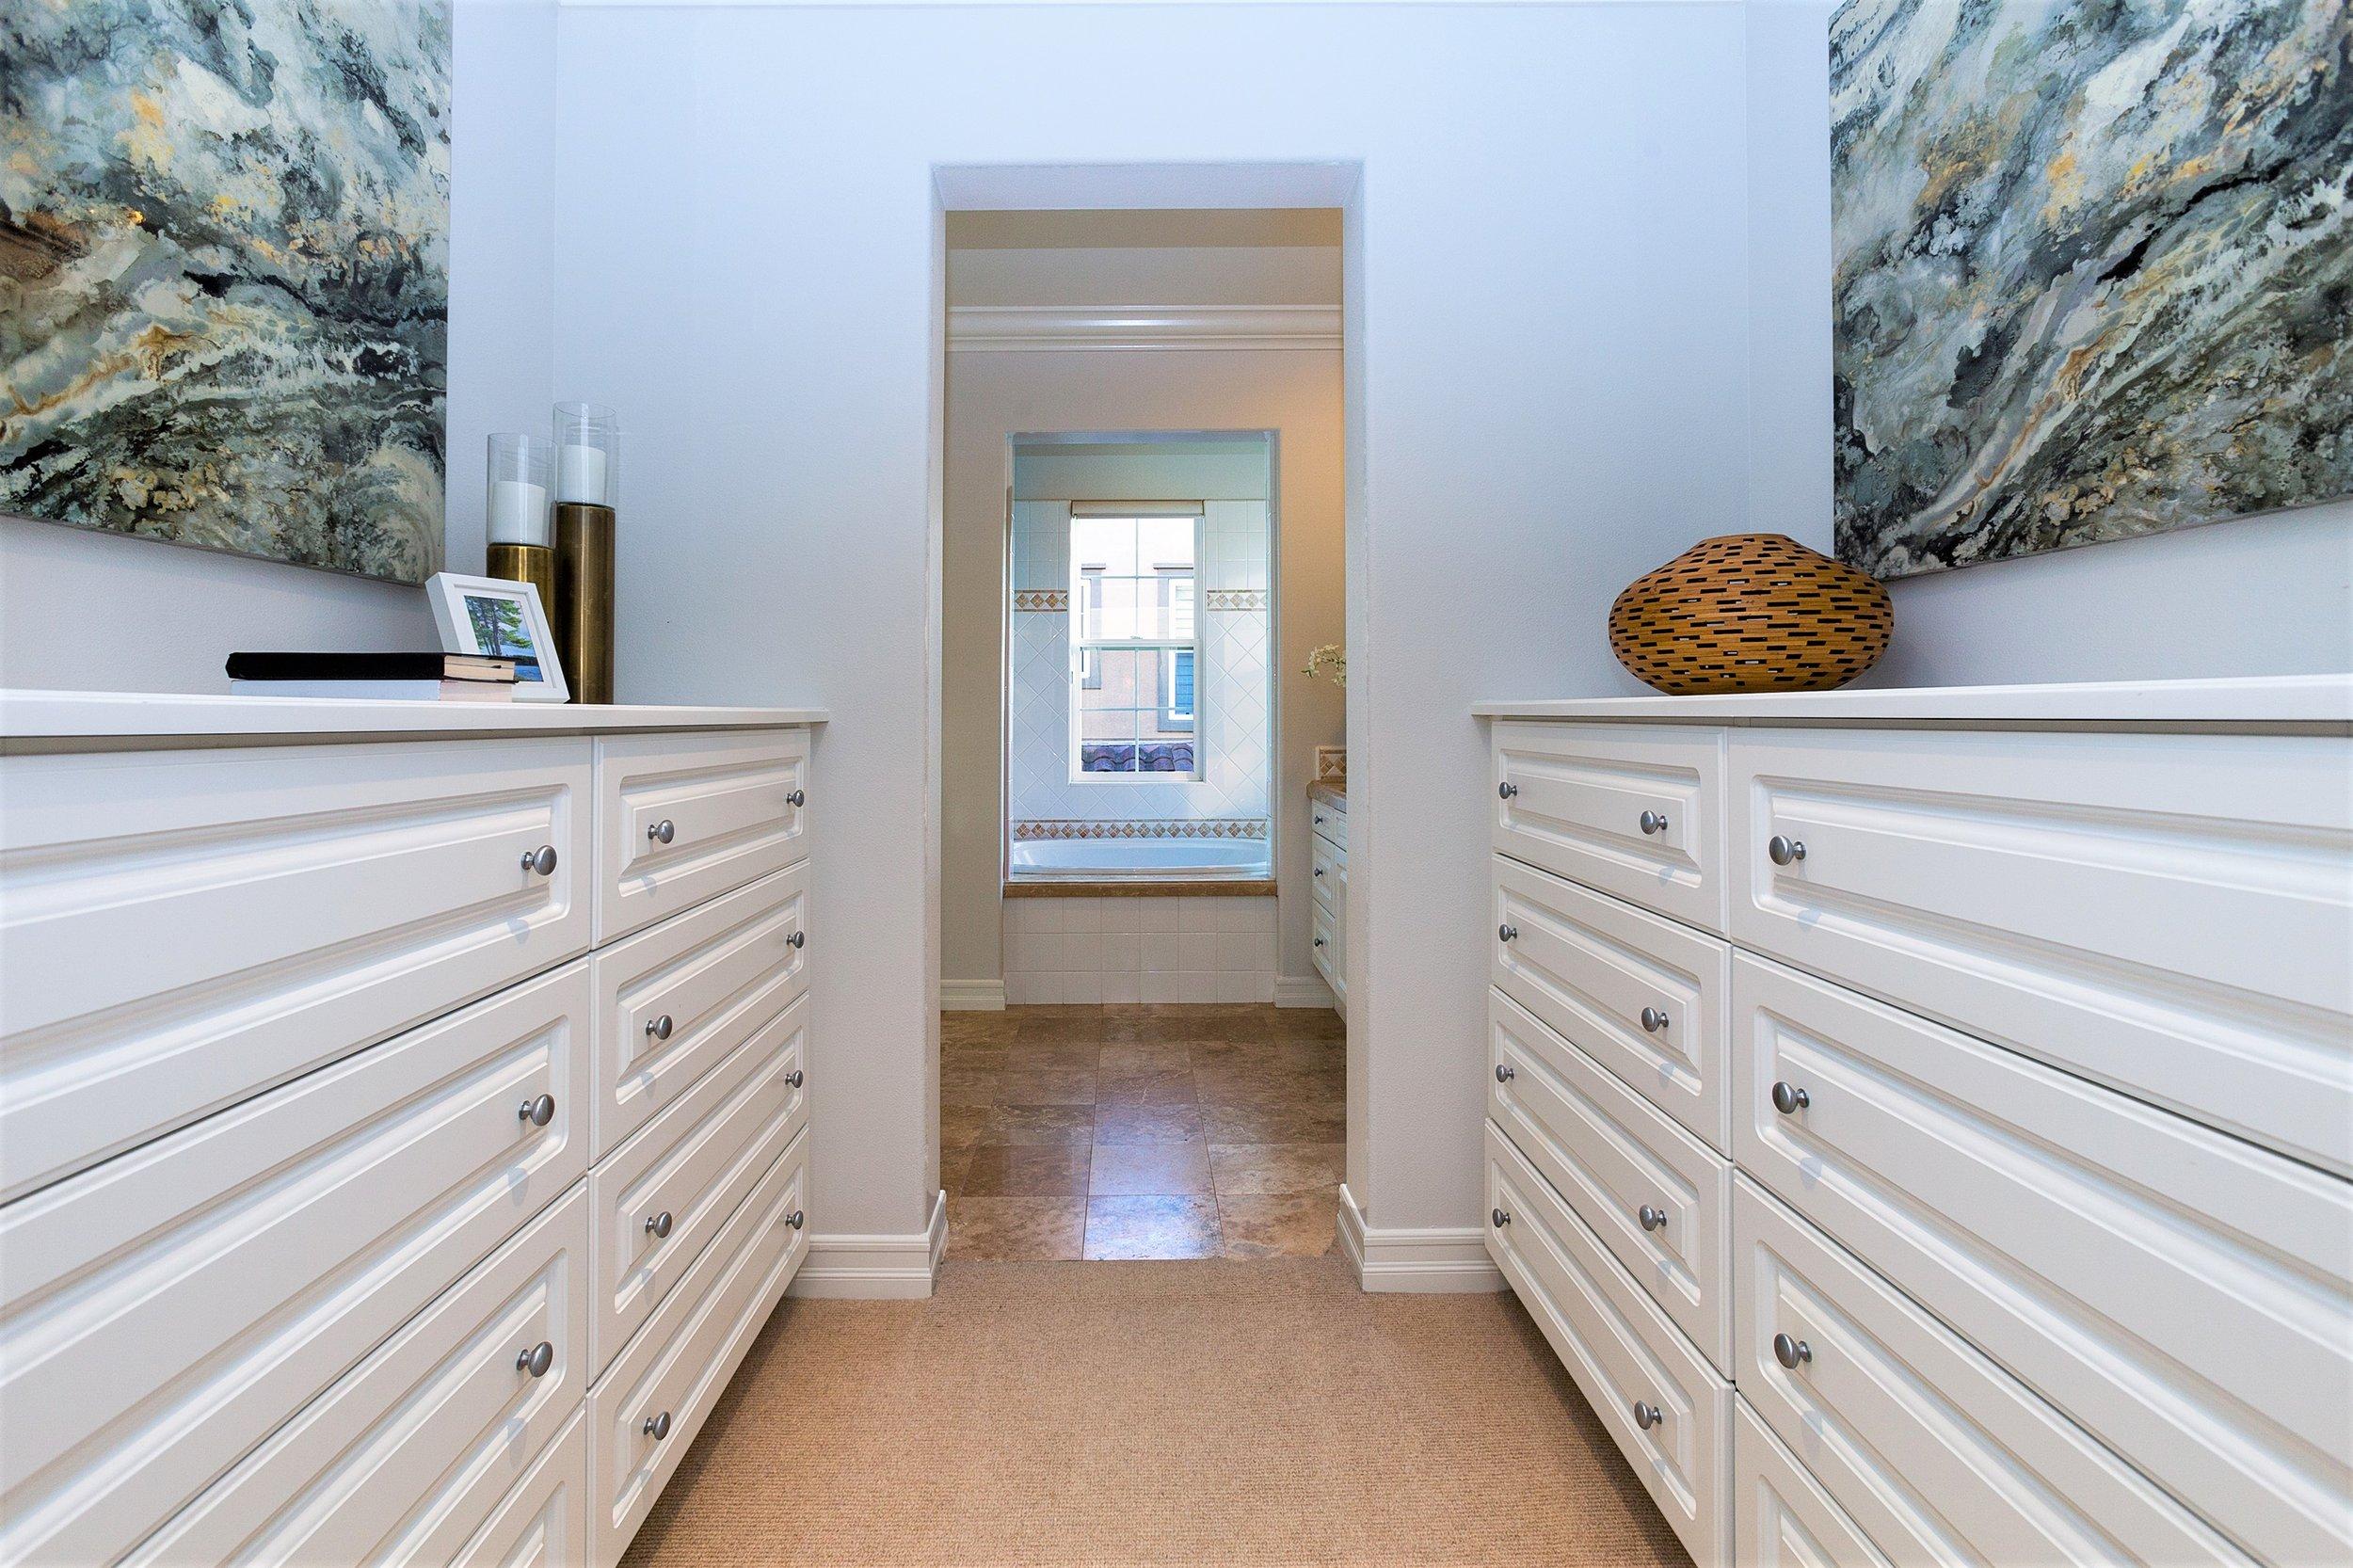 207 Tuberose -  - Master Builtin Cabinetry.jpg